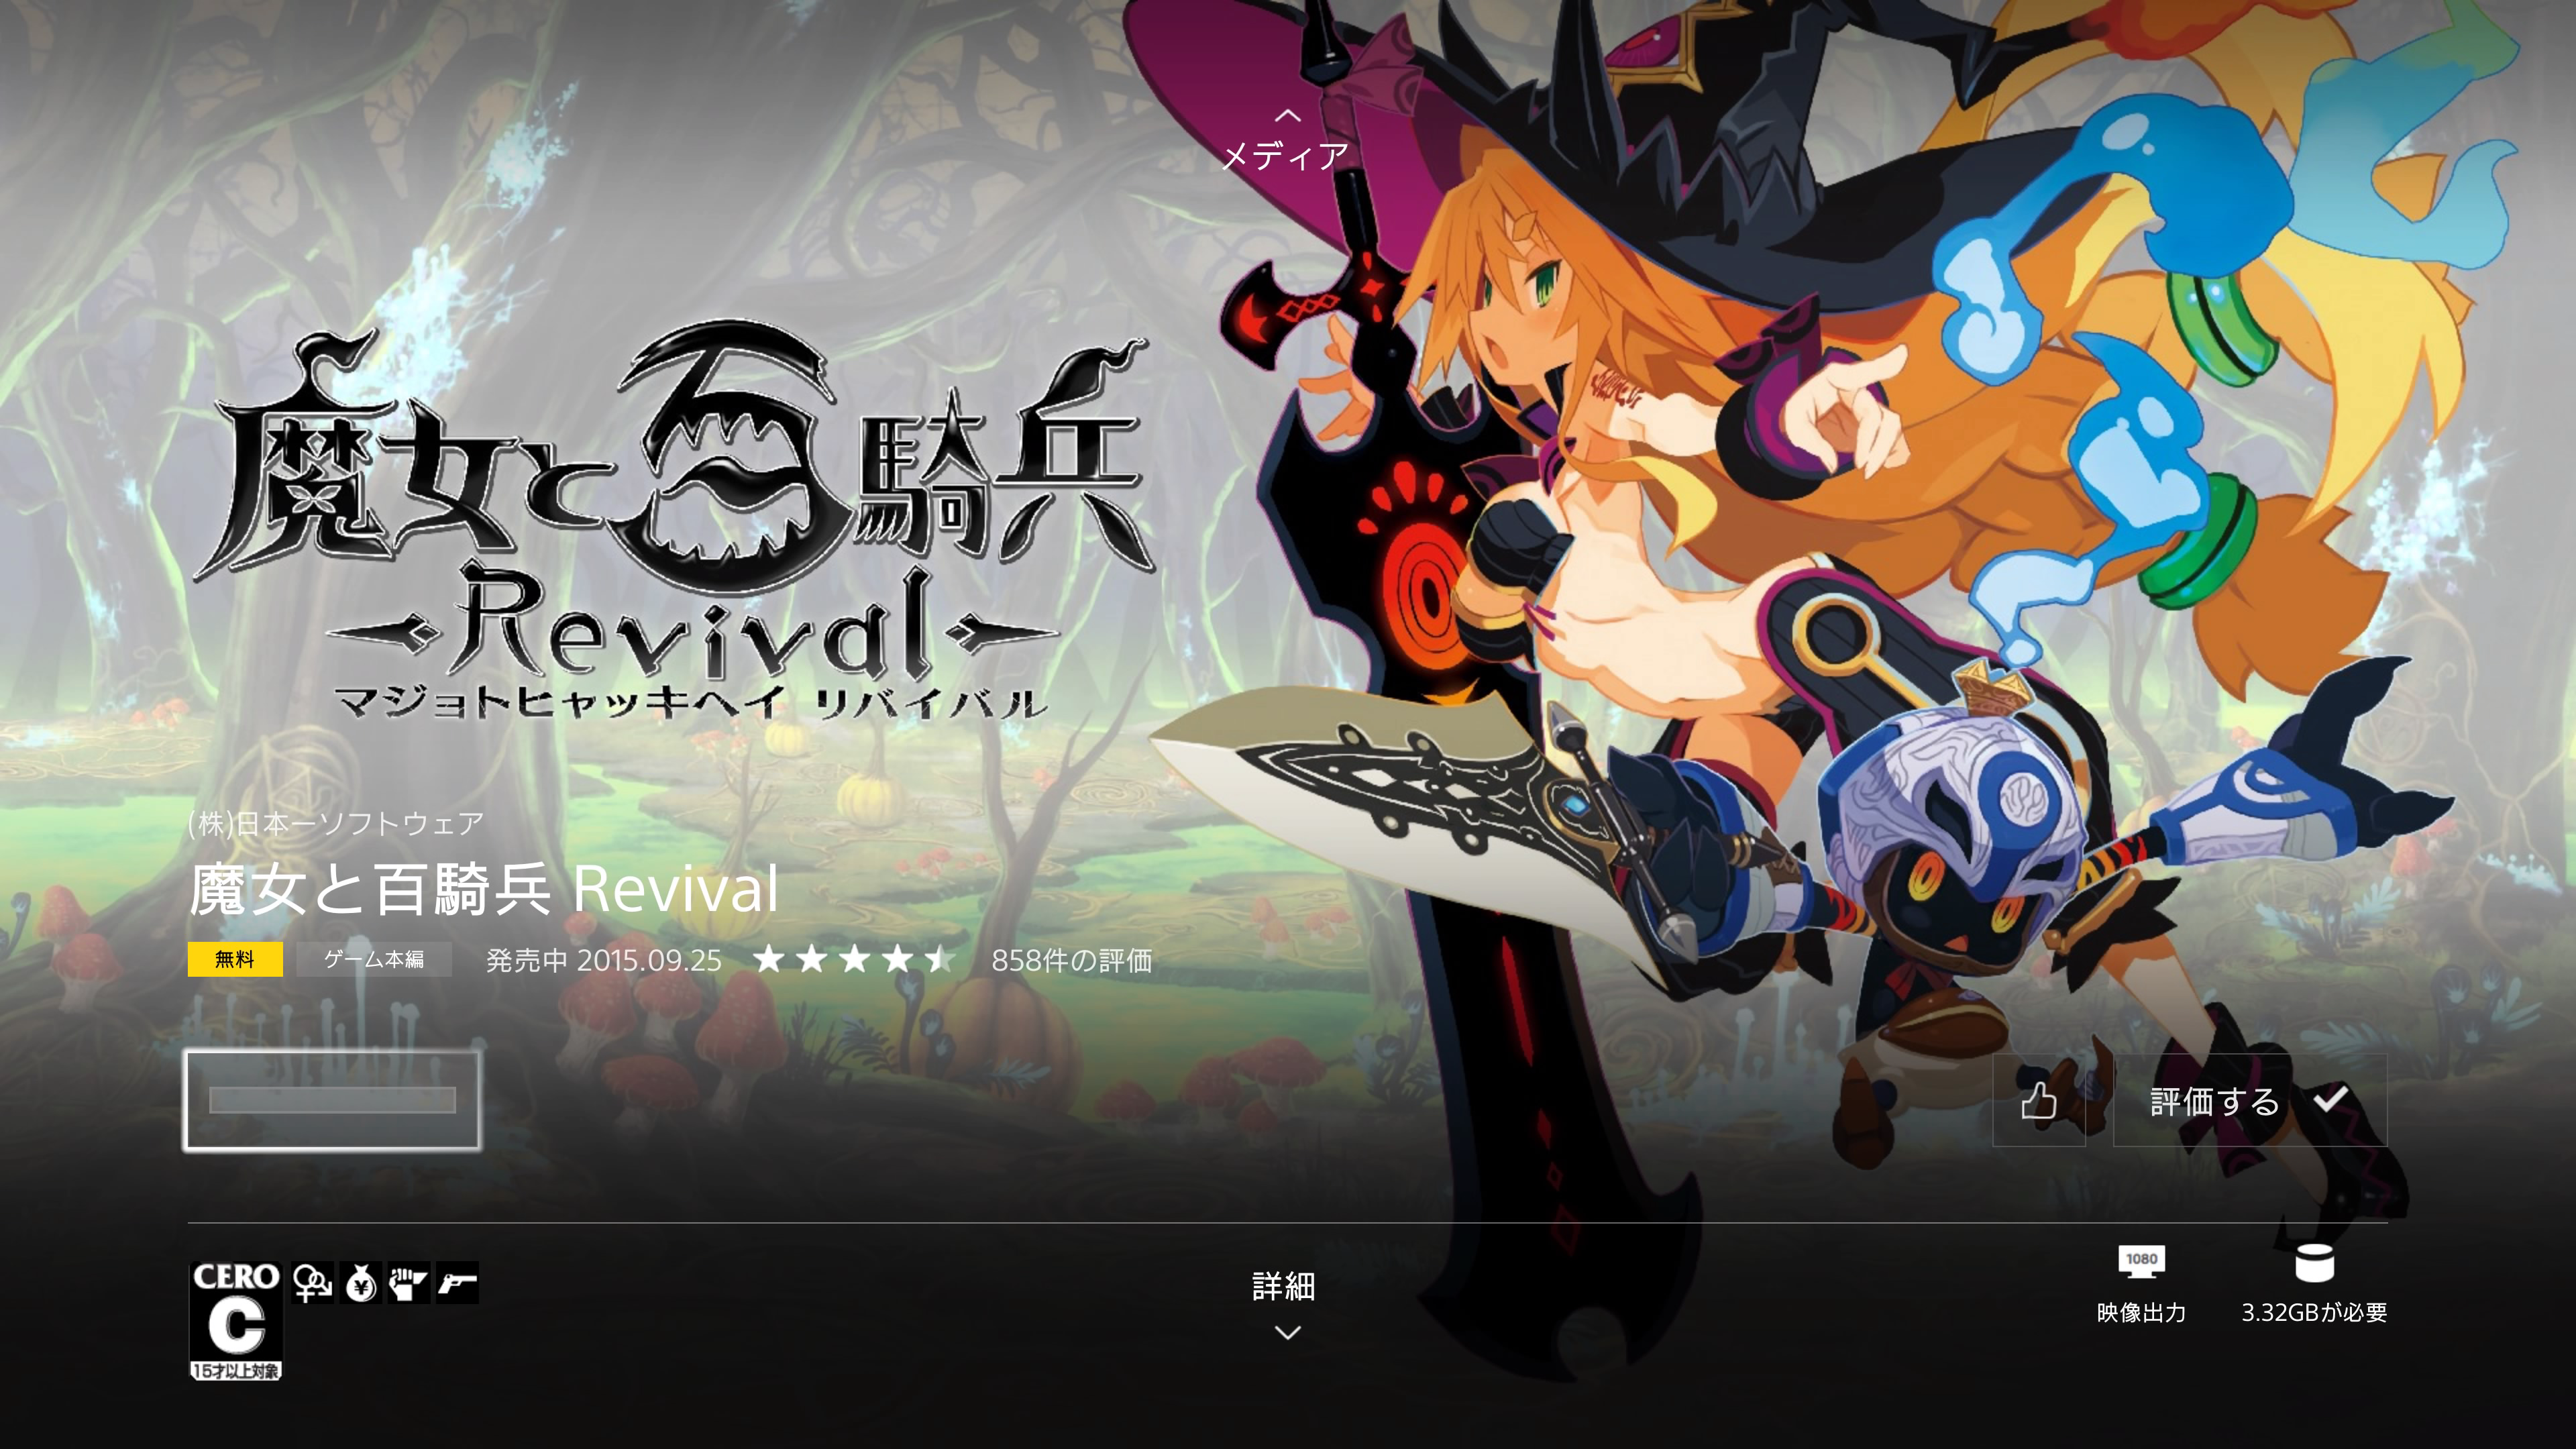 PS4 PlayStationStore加入で無料プレイ可能なゲーム【魔女と百騎兵】ダウンロードしてみた